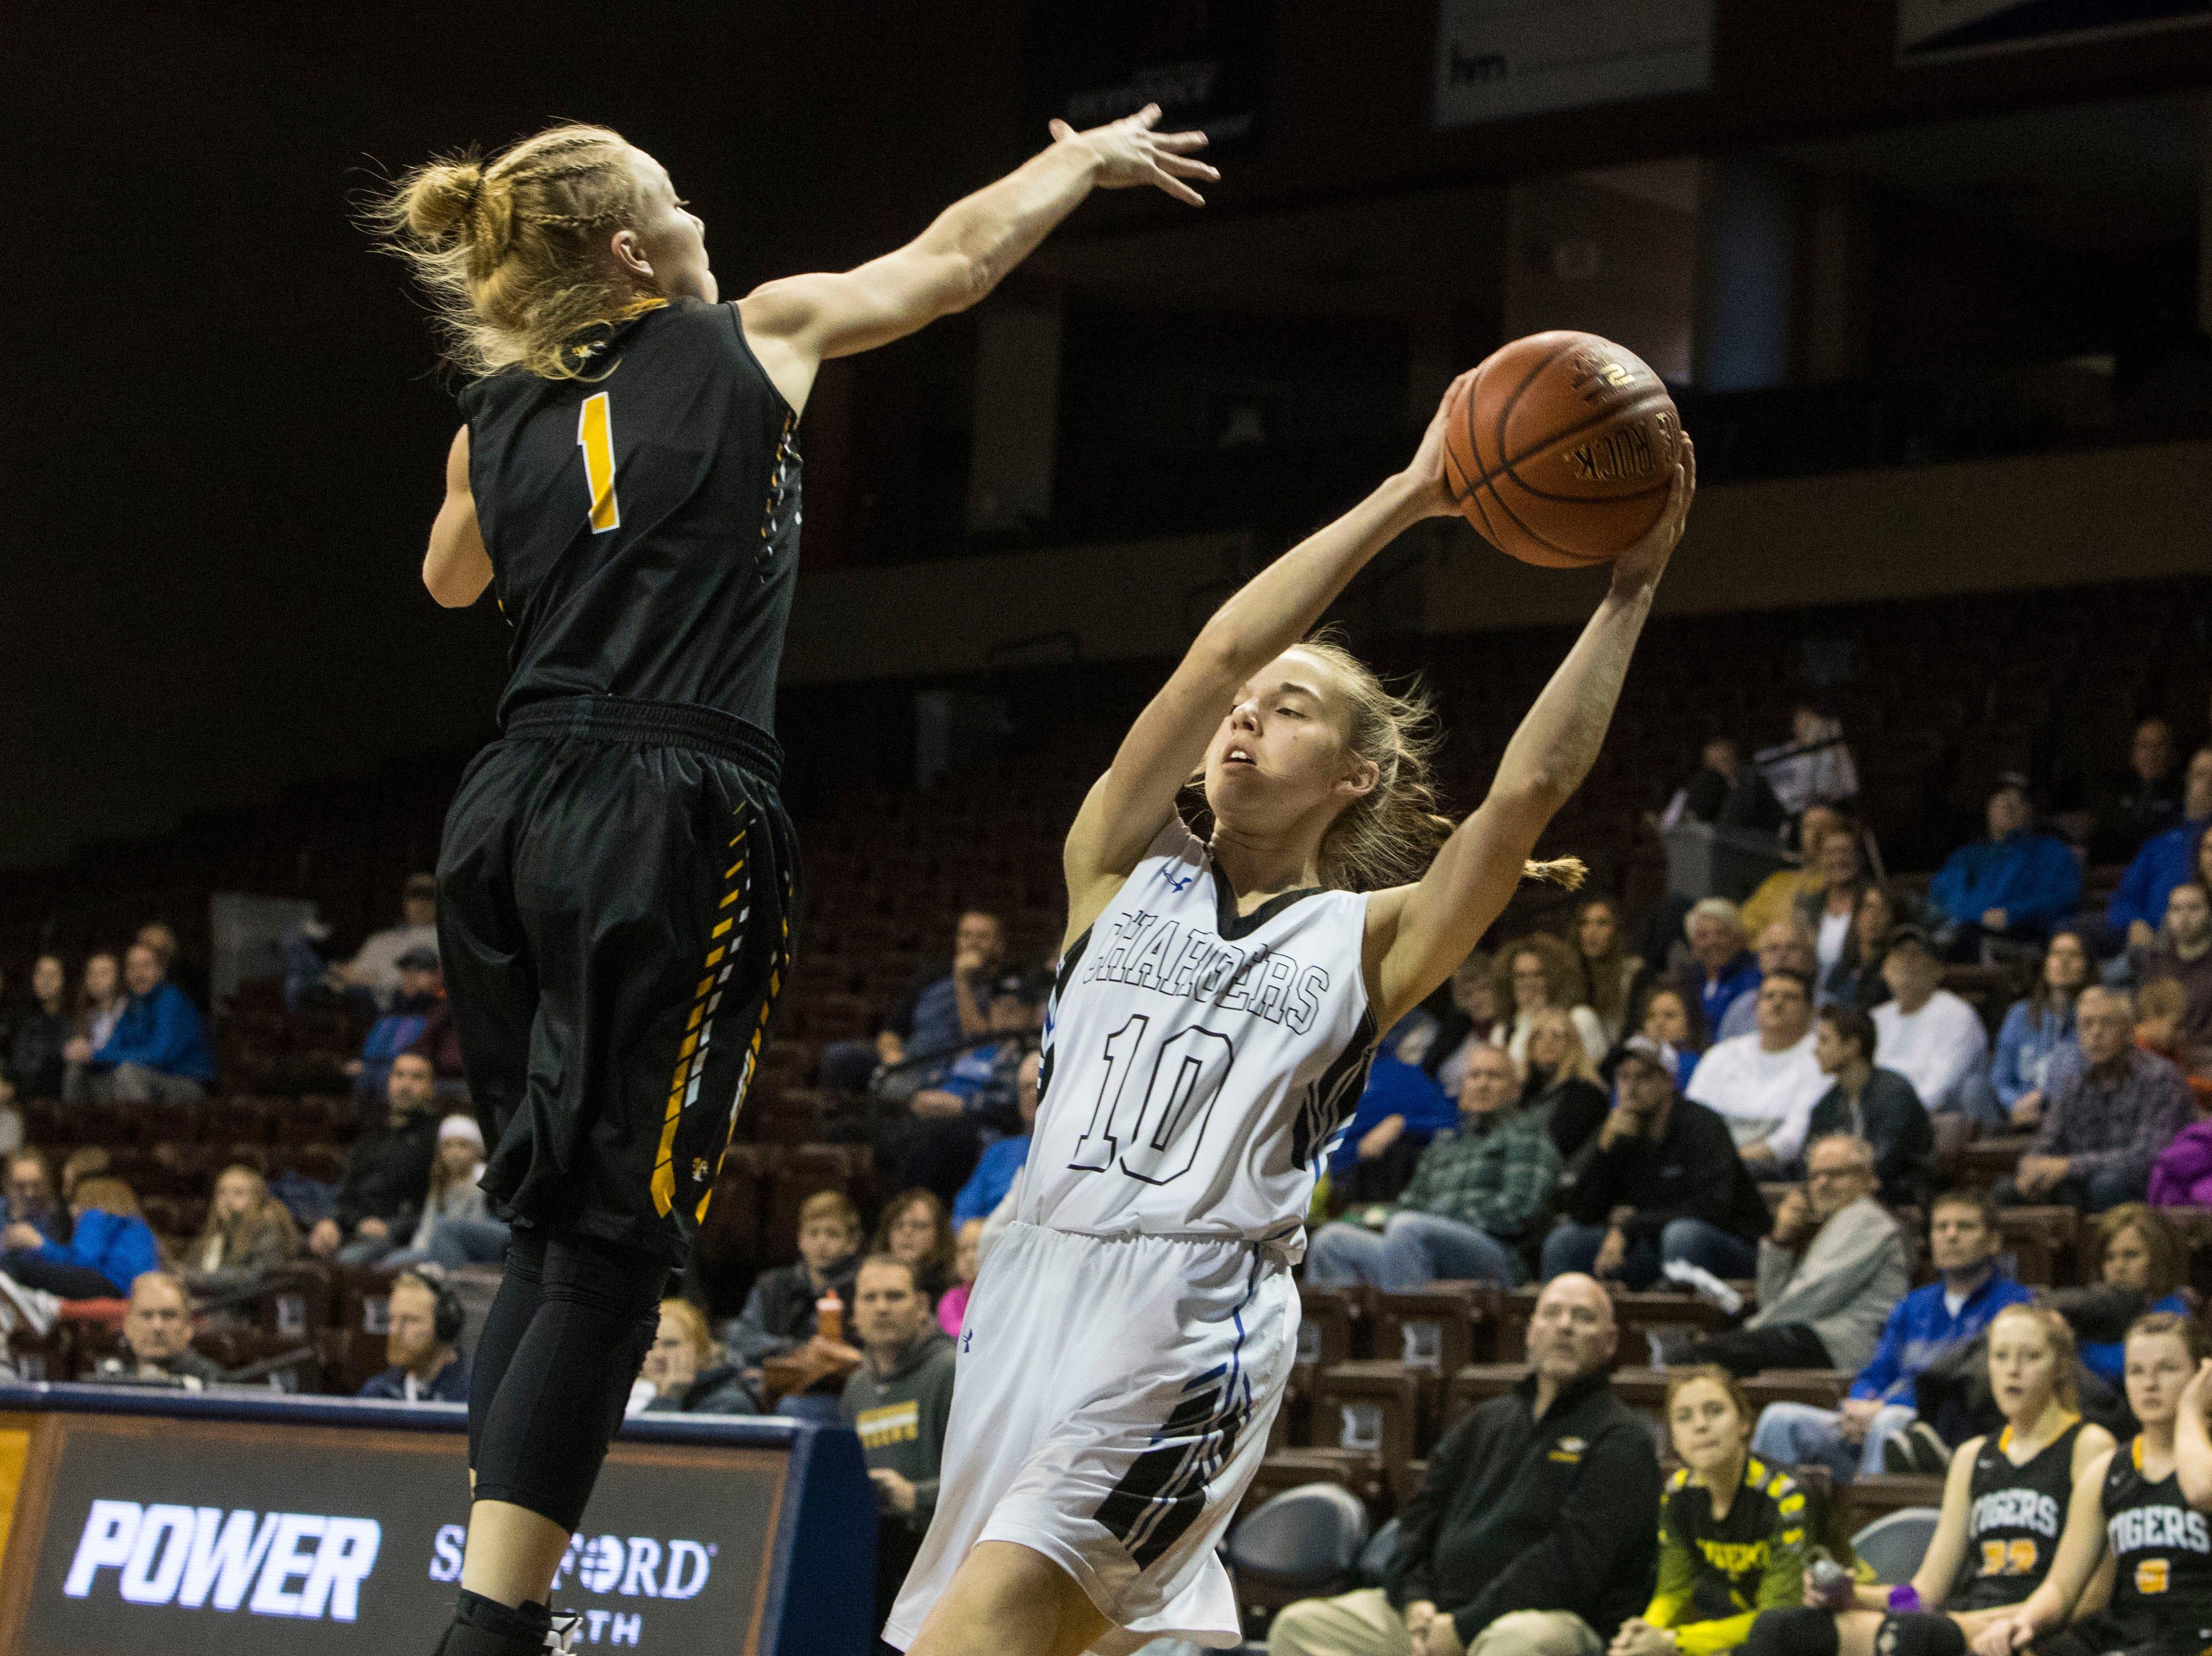 Hutchinson's Karissa Korson (1) blocks Sioux Falls Christian's Maren Reu (10) from passing the ball at the Hoop City Classic at the Sanford Pentagon in Sioux Falls, S.D., Saturday, Dec. 29, 2018.